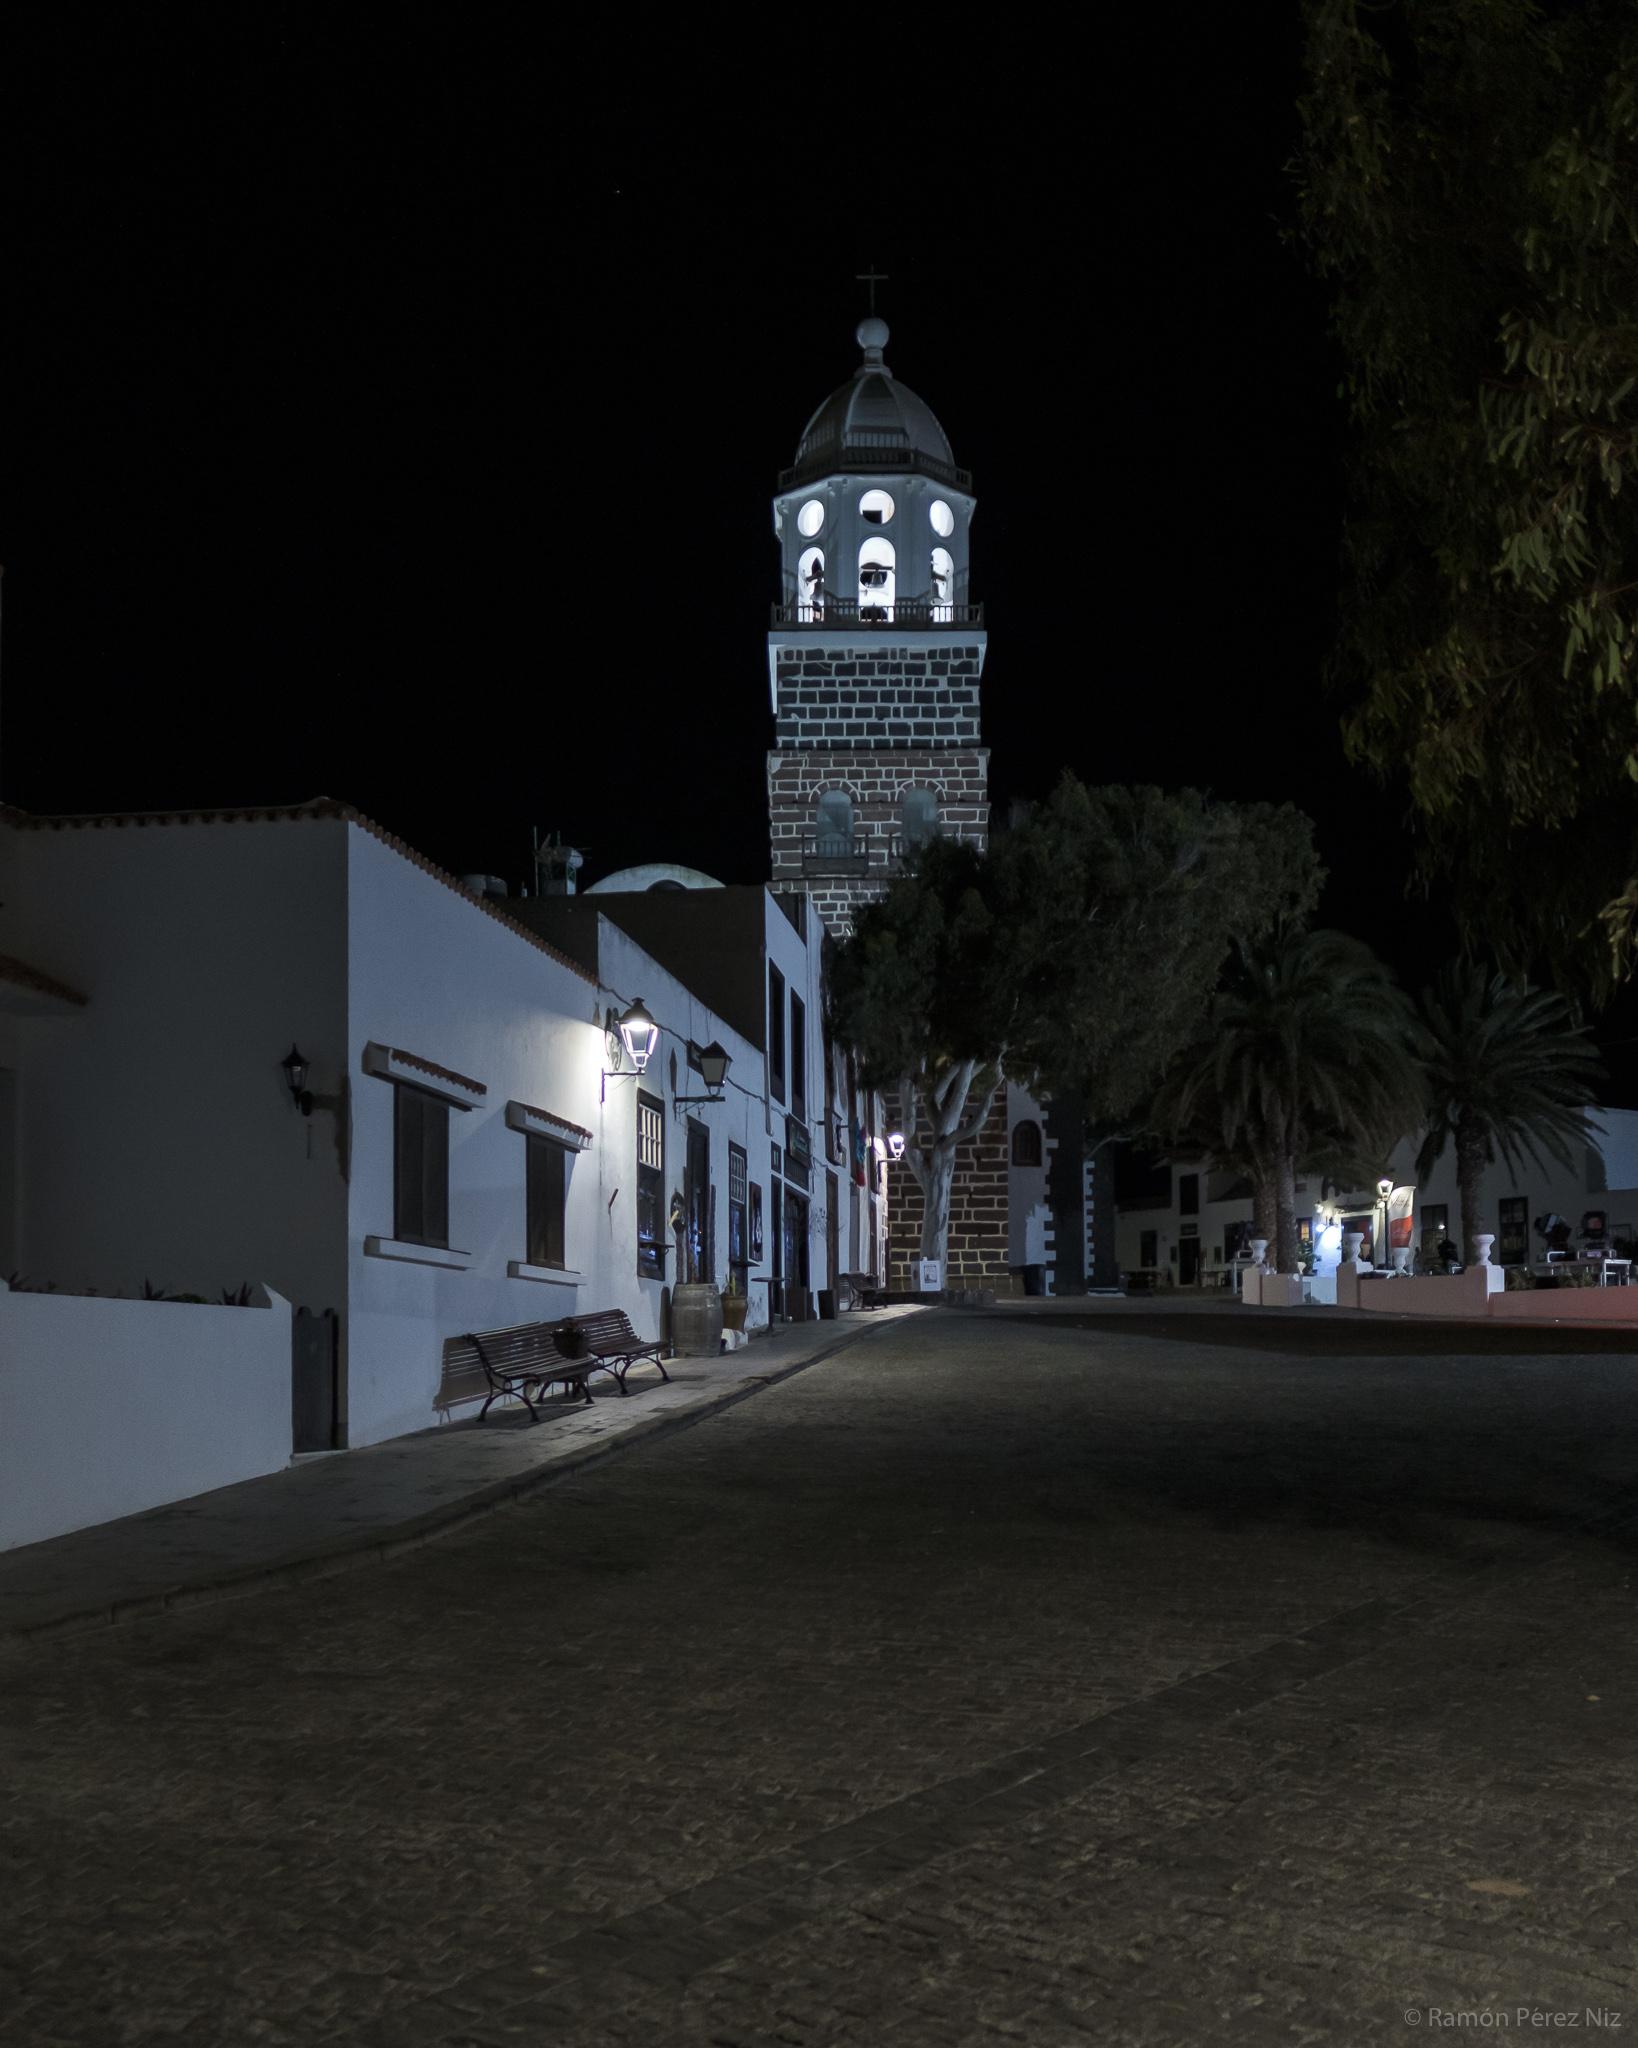 Foto de Ramón Pérez Niz en Teguise